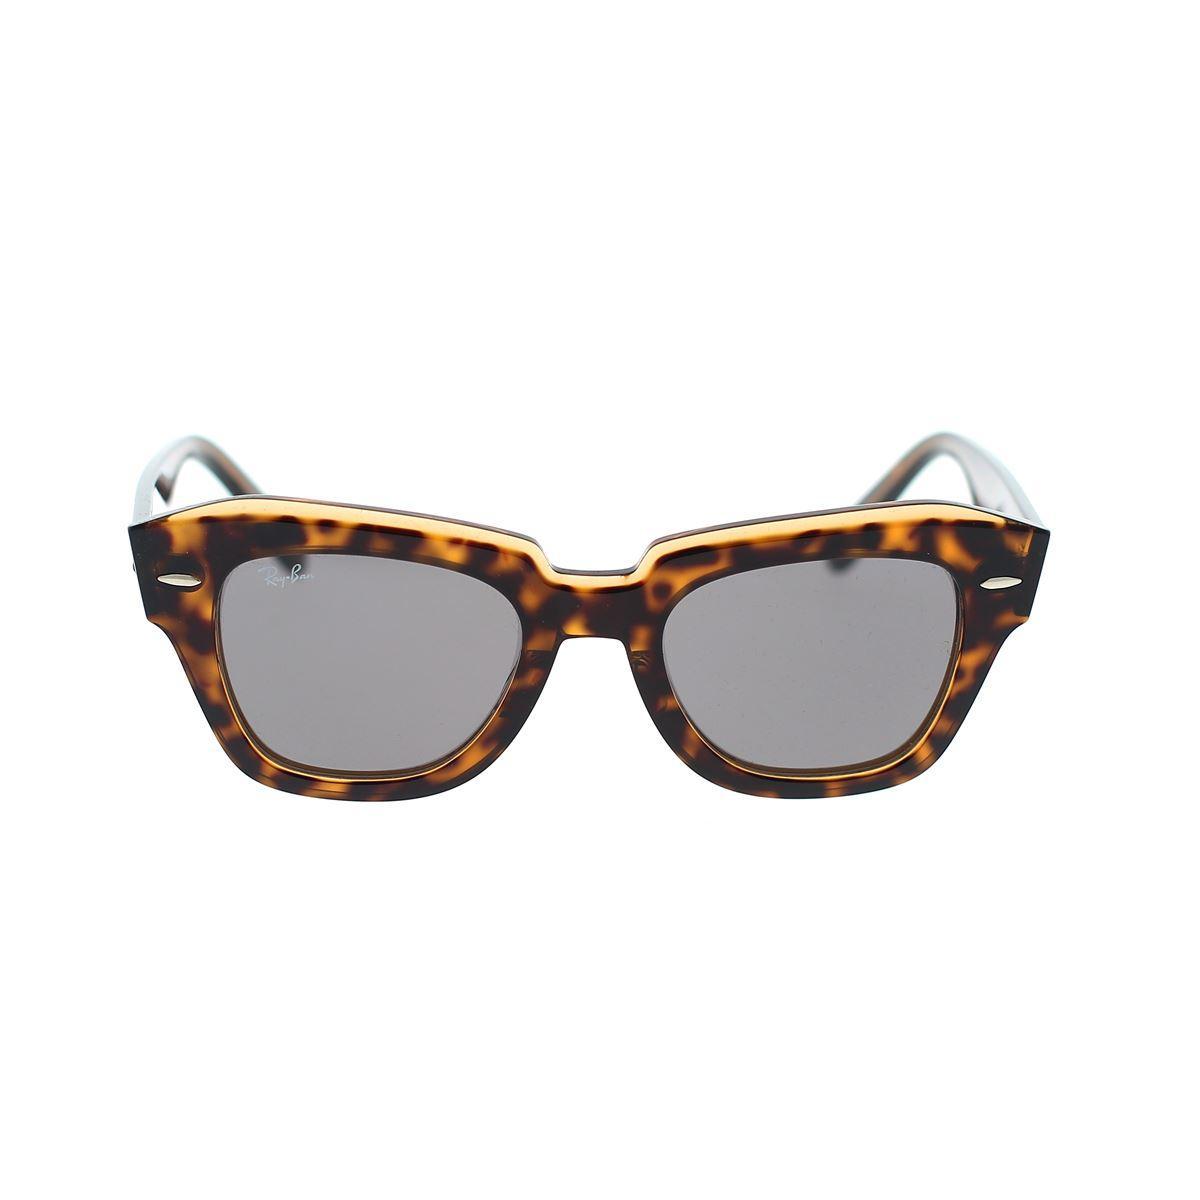 ray-ban occhiali da sole state street rb2186 1292b1